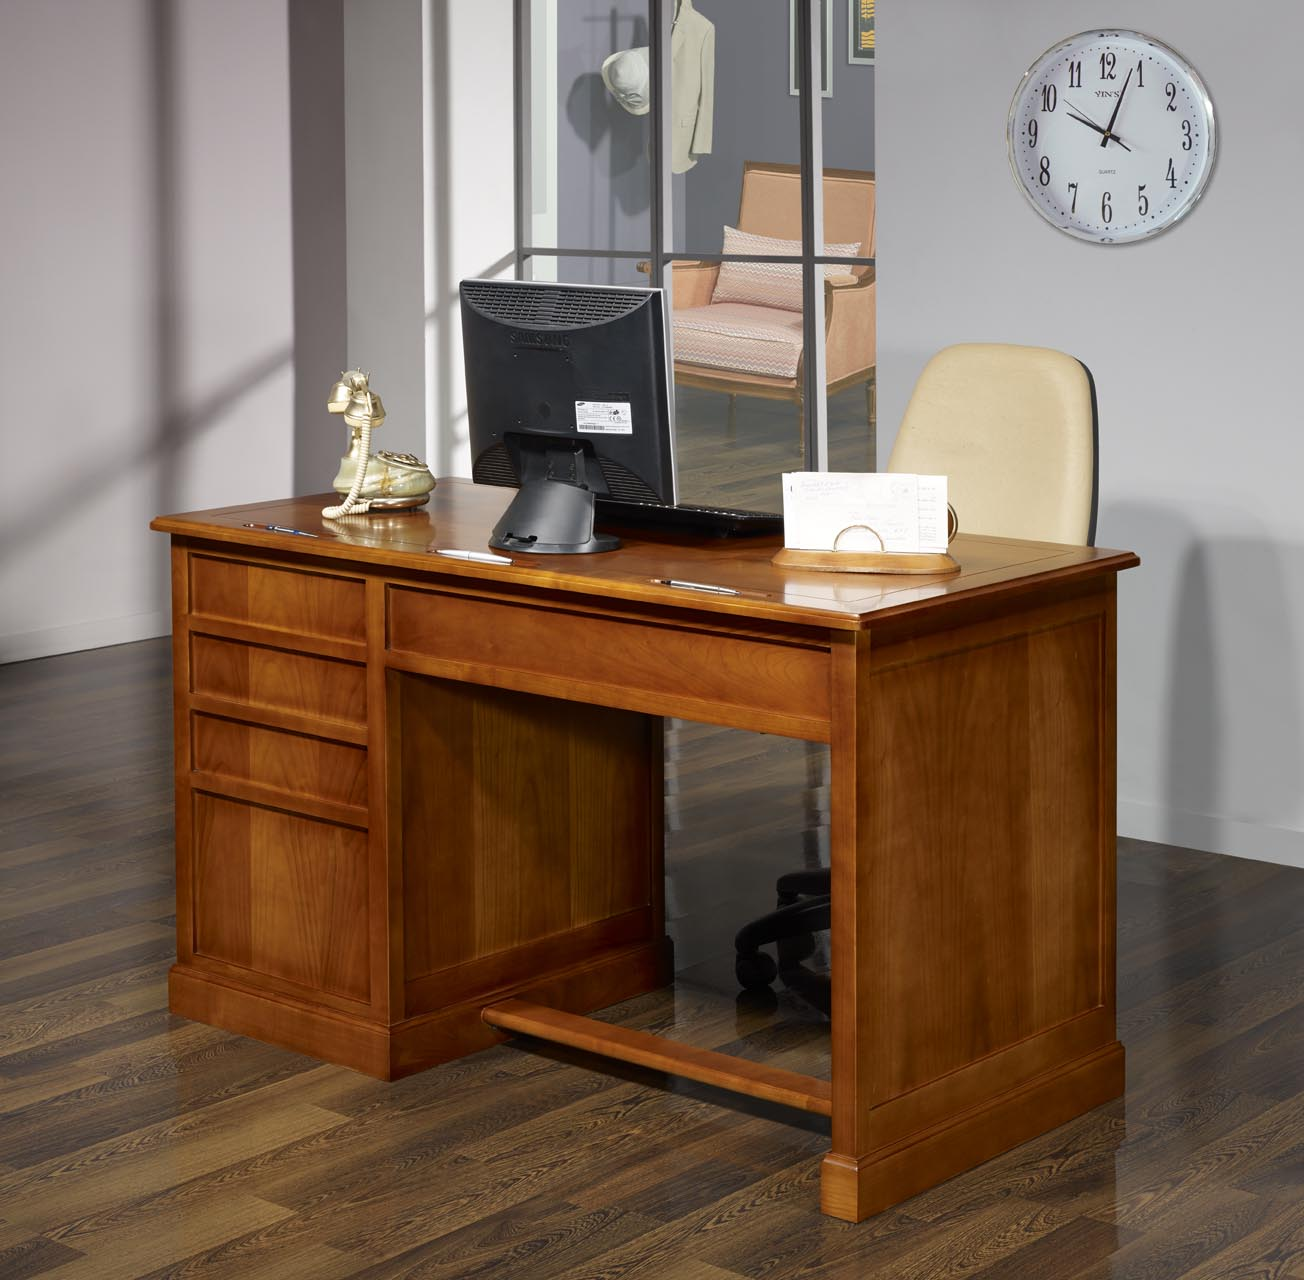 Mesa oficina escritorio jeanne con 5 cajones hecho de cereza maciza estilo louis philippe - Mesa escritorio con cajones ...